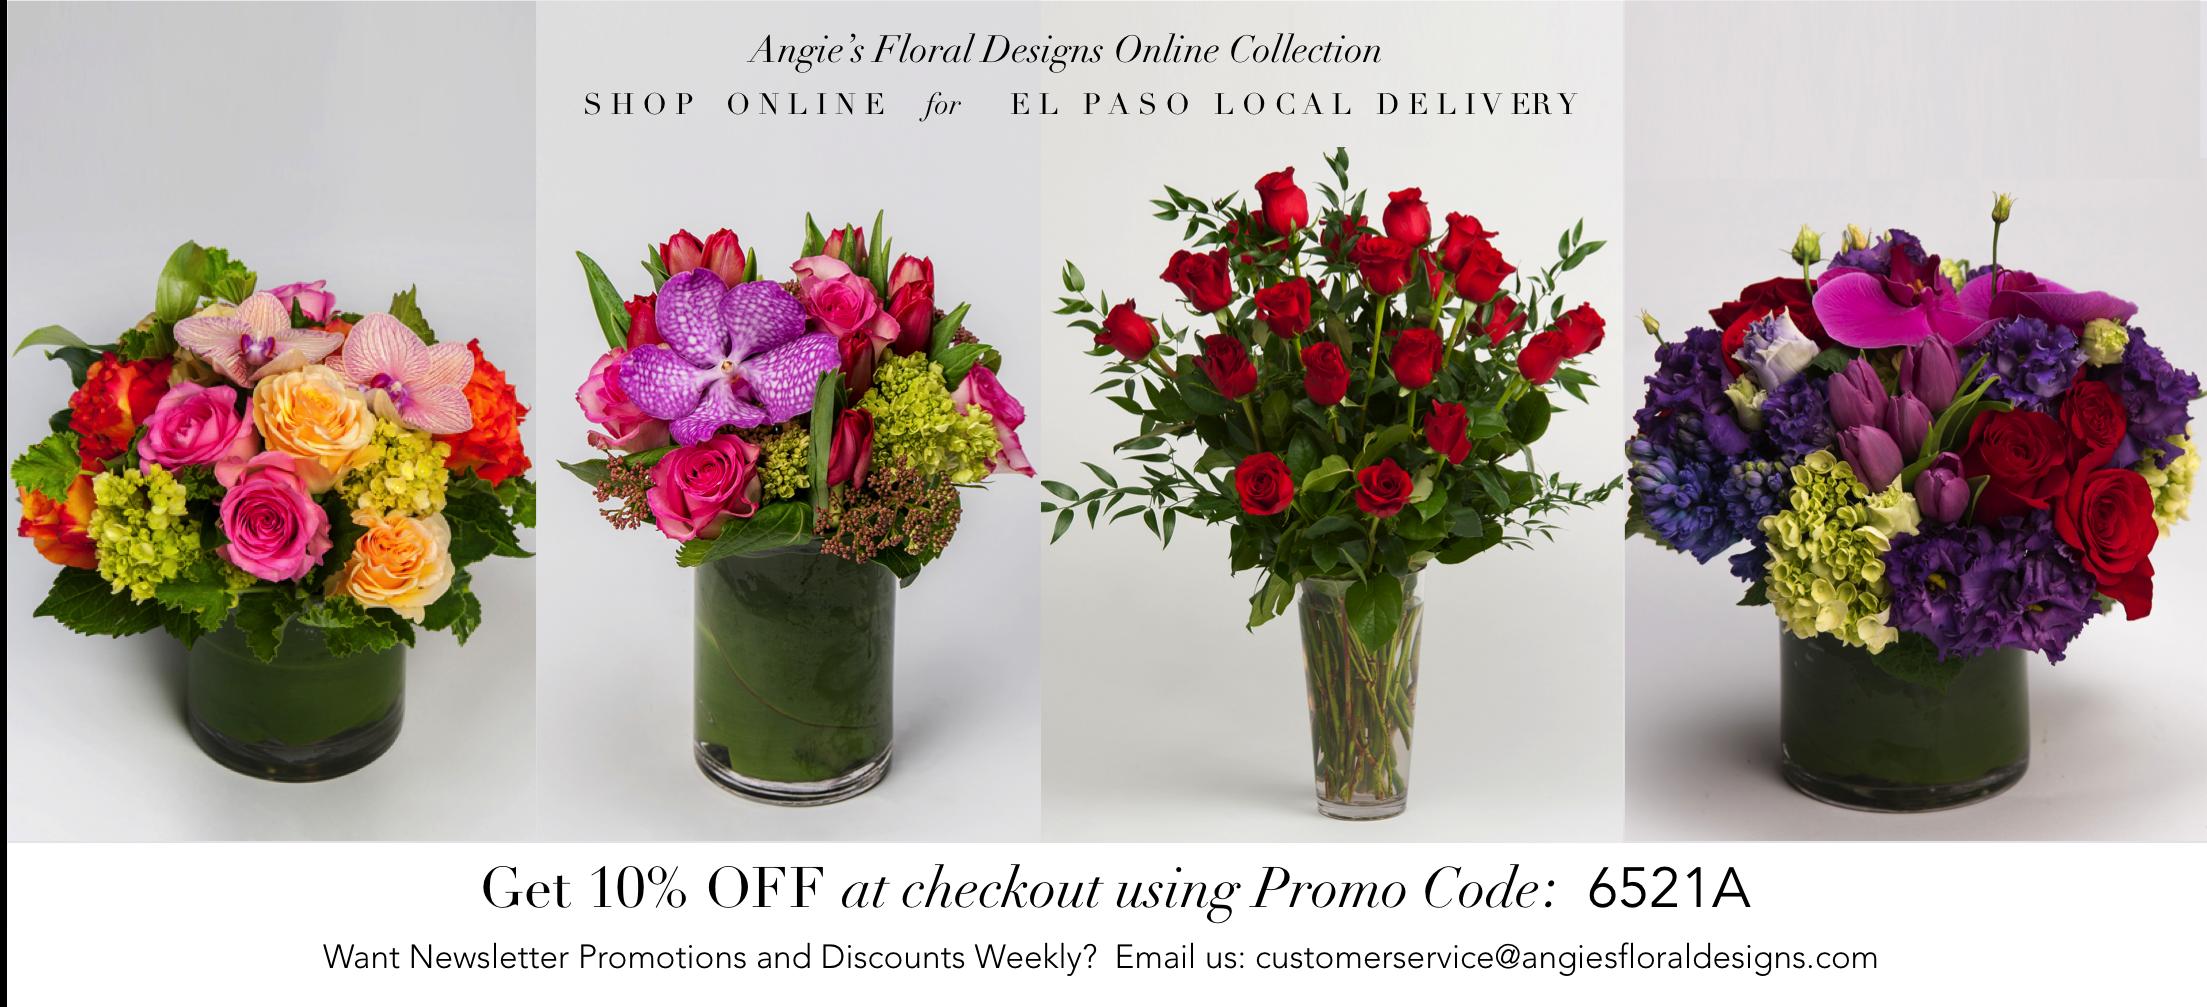 0-angies-floral-designs-el-paso-florist-el-paso-flowers-el-paso-florist-flower-delivery-79912-angies-flowers-floristeria.png